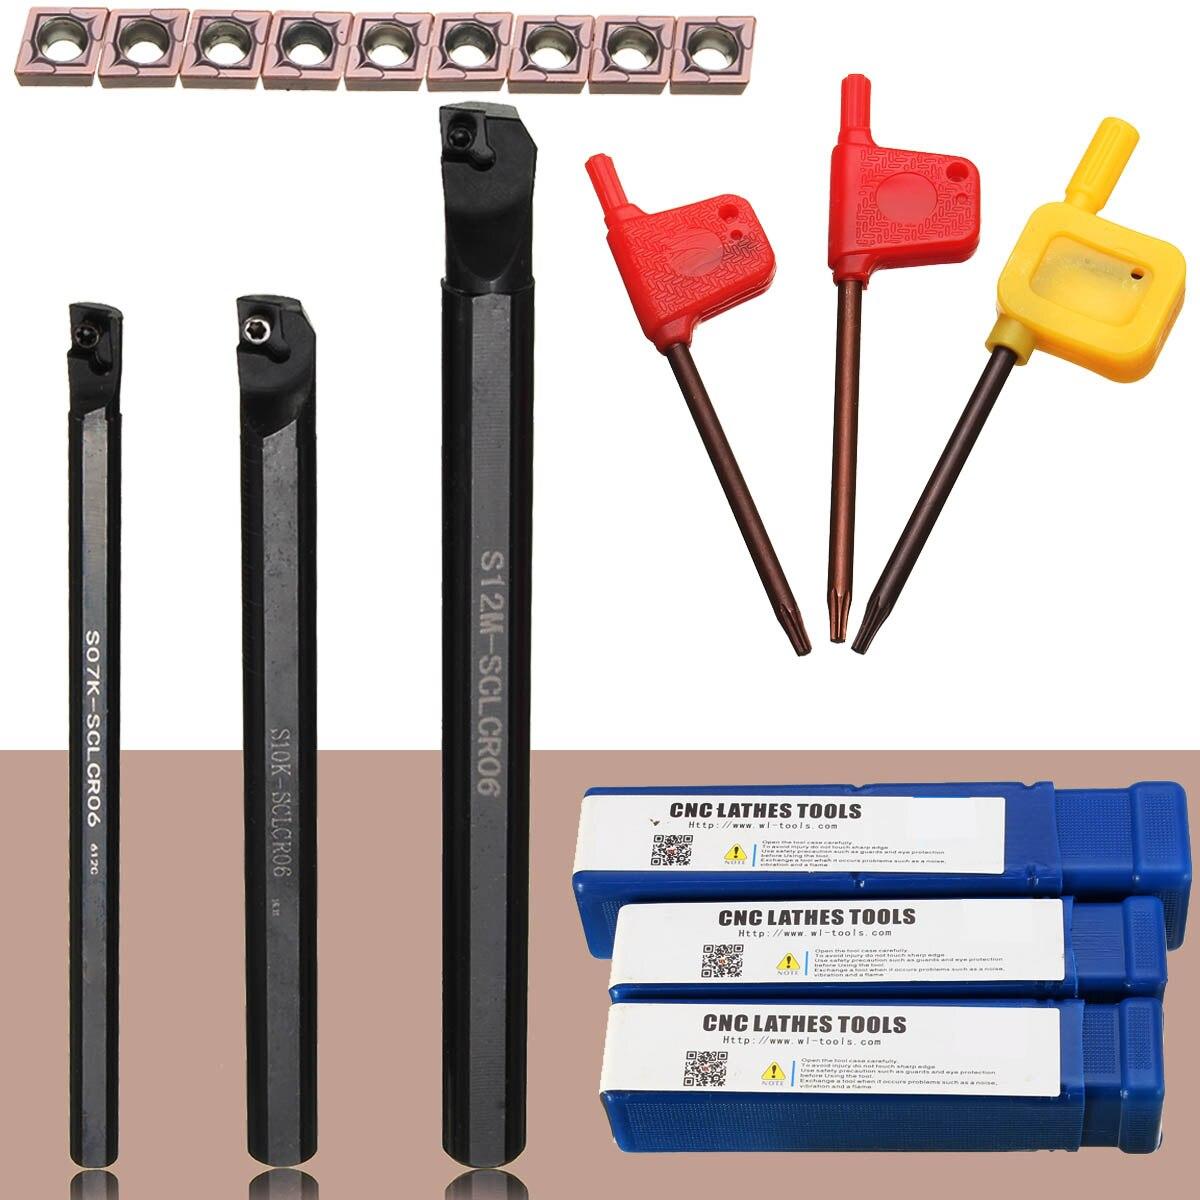 1 stücke S07K-SCLCR06 + 1 stücke S10K-SCLCR06 + 1 stücke S12M-SCLCR06 Drehmaschine Halter Drehen Boring Bar 7/10 /12mm + 10 stücke CCMT0602 Einsätze